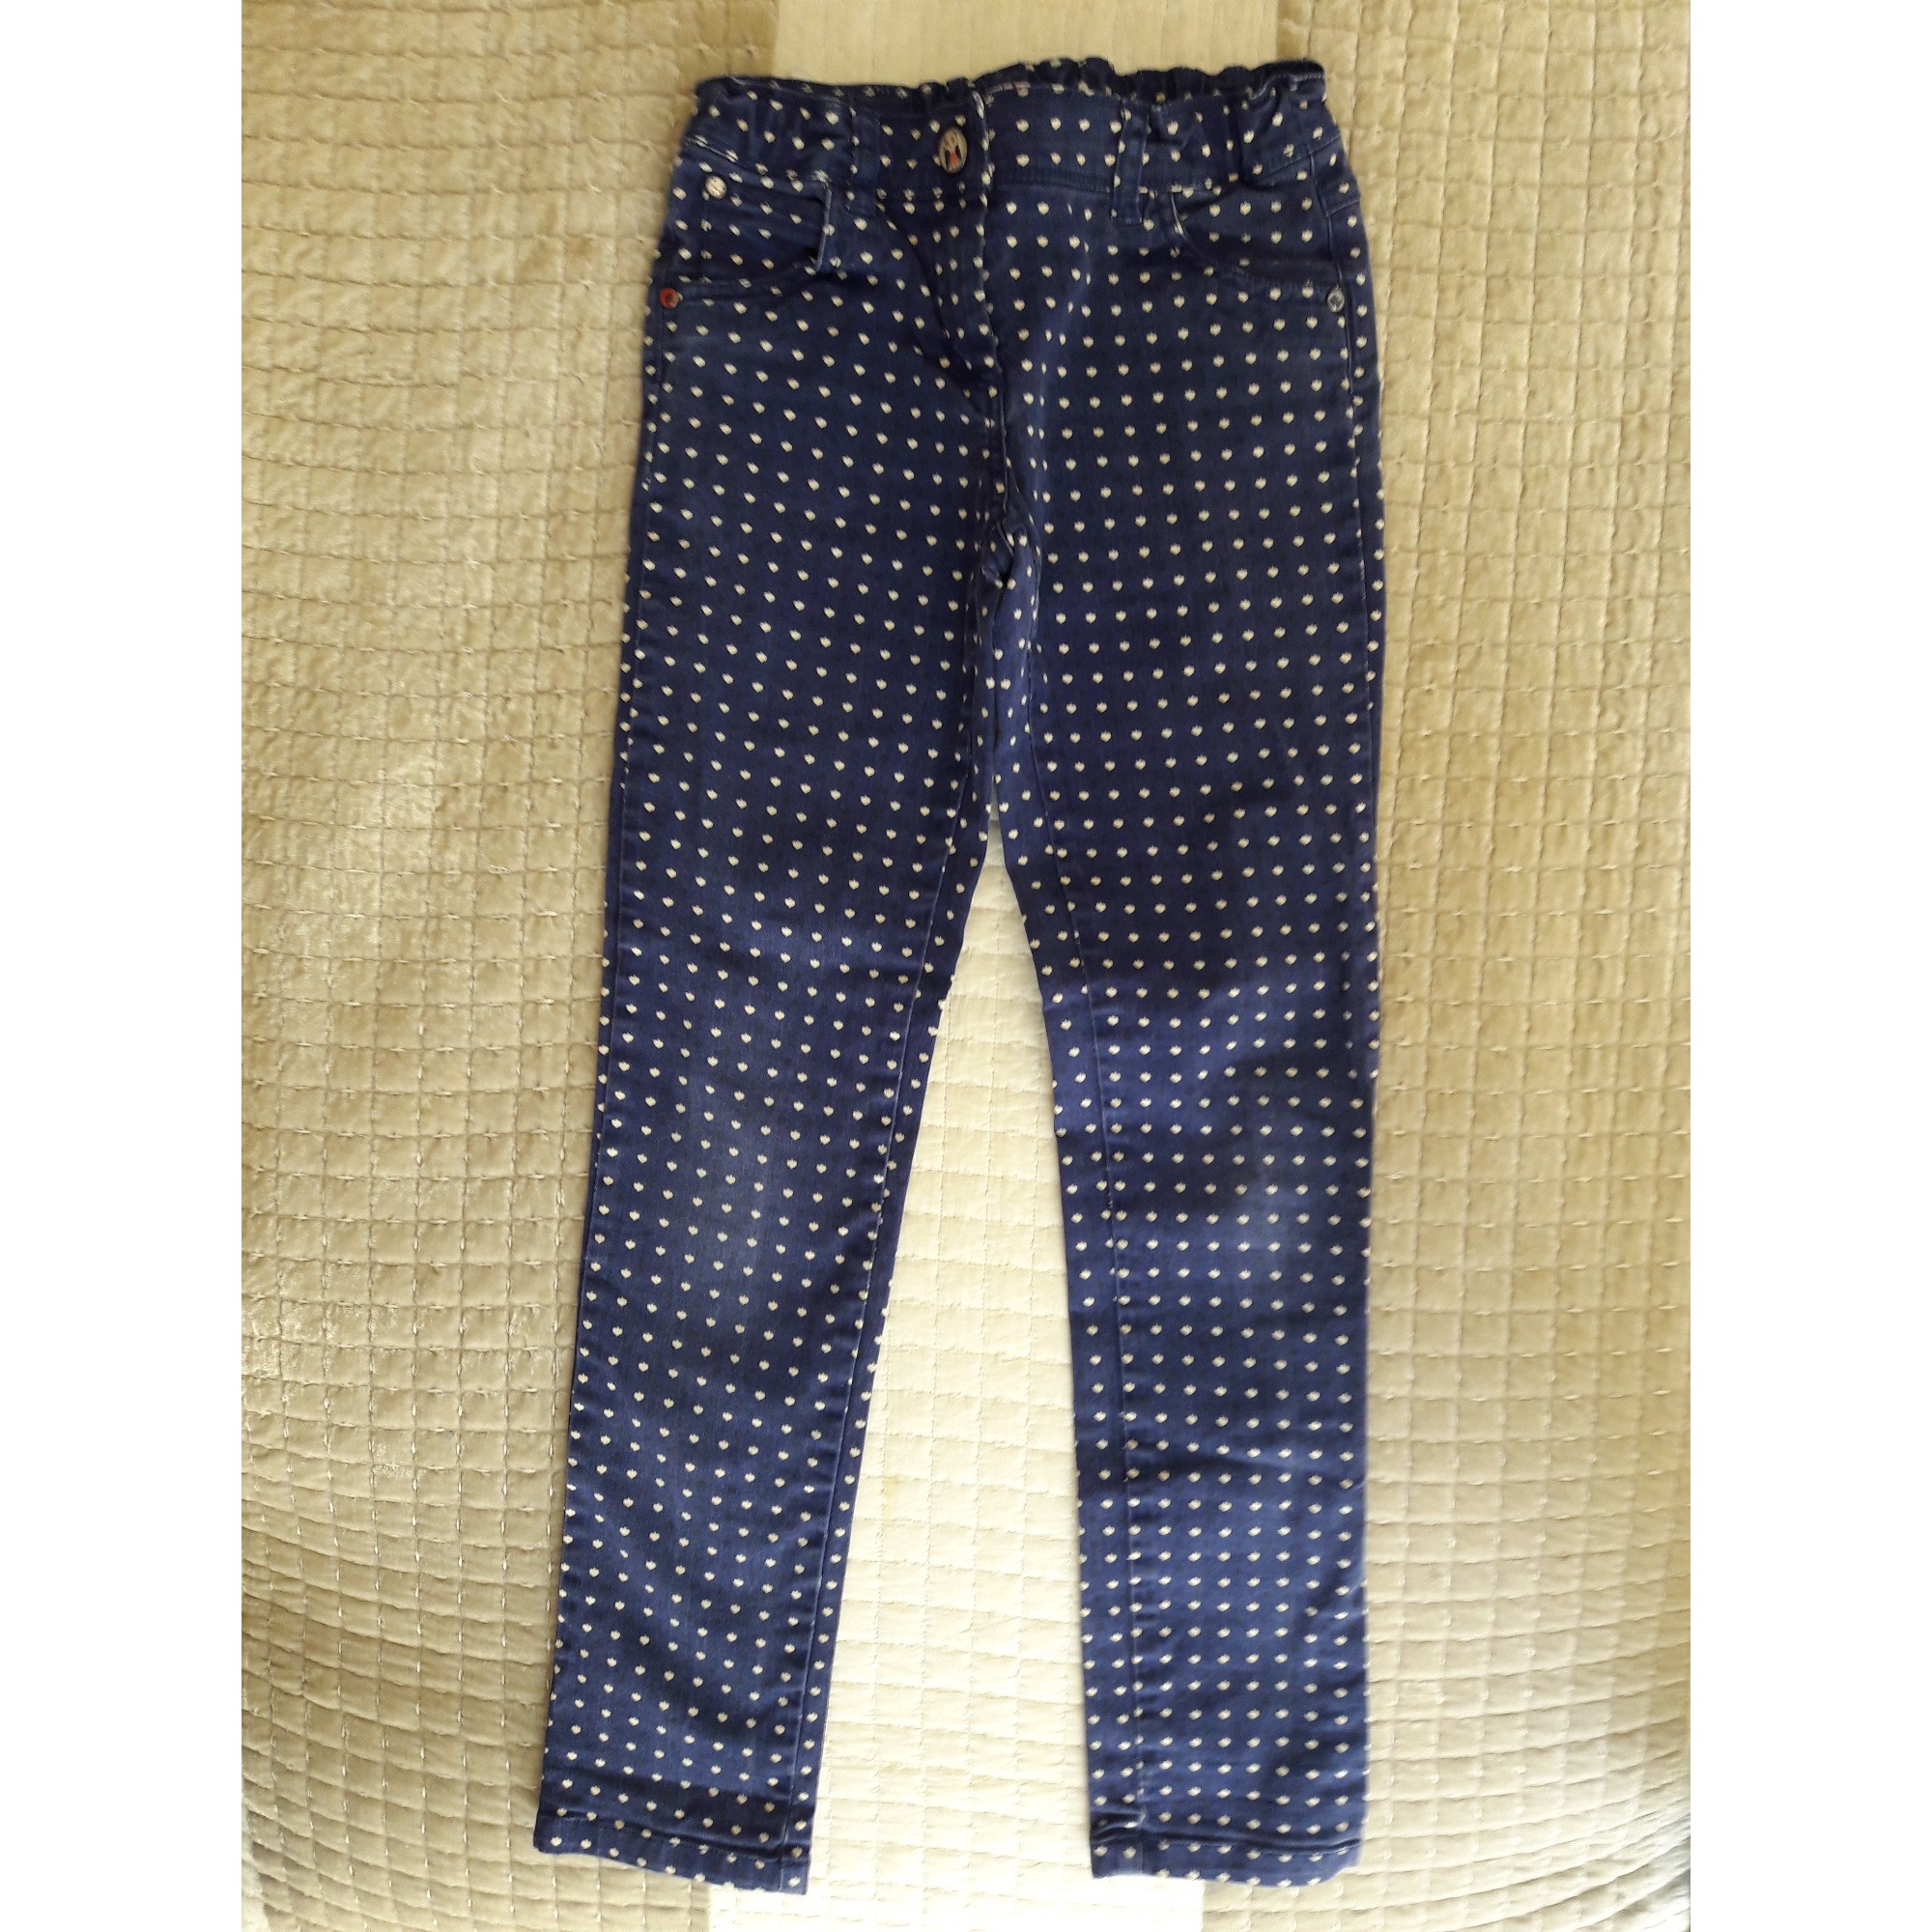 Pantalon DU PAREIL AU MÊME DPAM Bleu, bleu marine, bleu turquoise